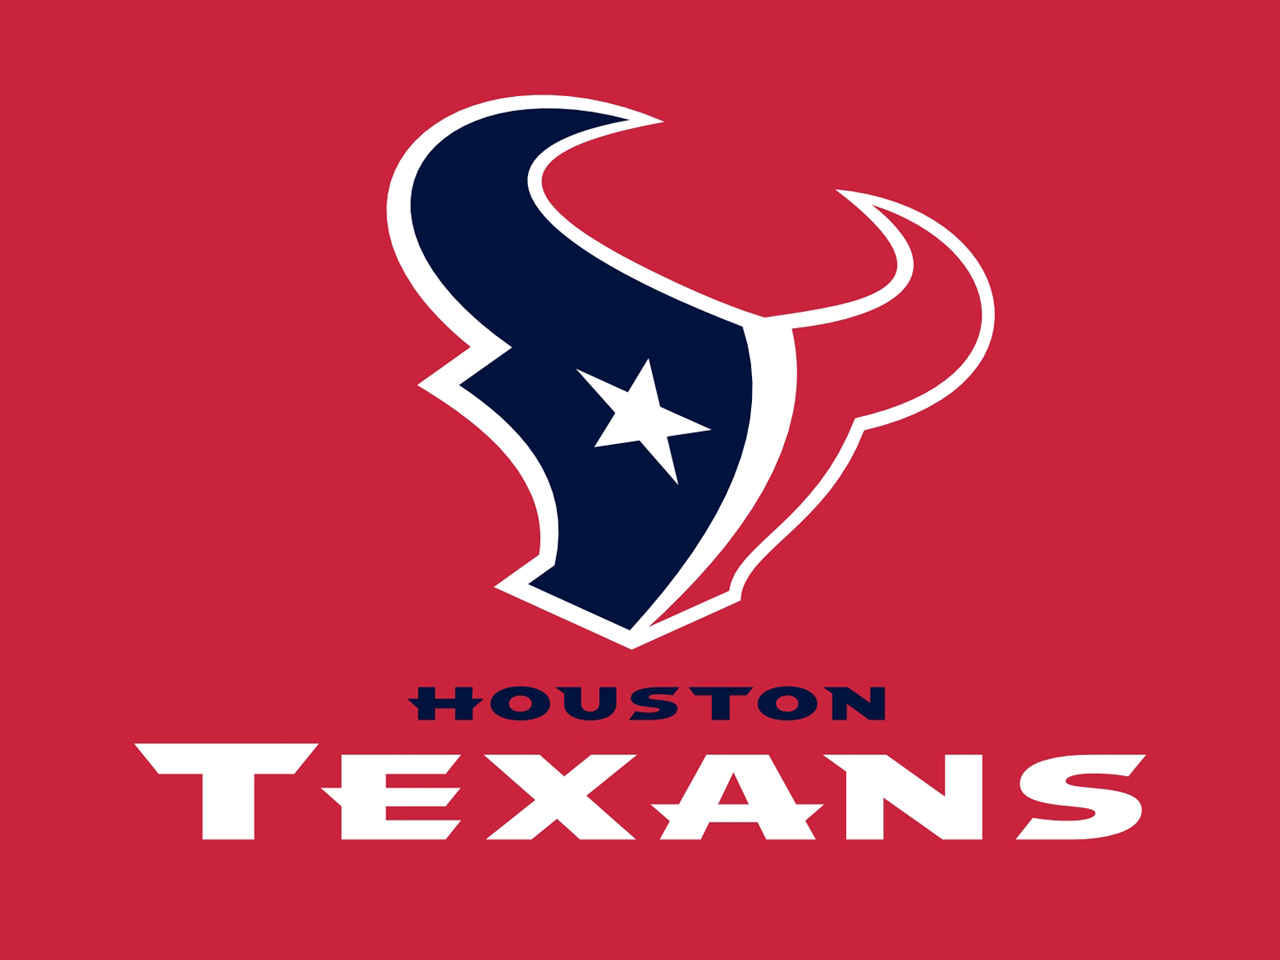 Texans Wallpaper 14592 1280x960 px